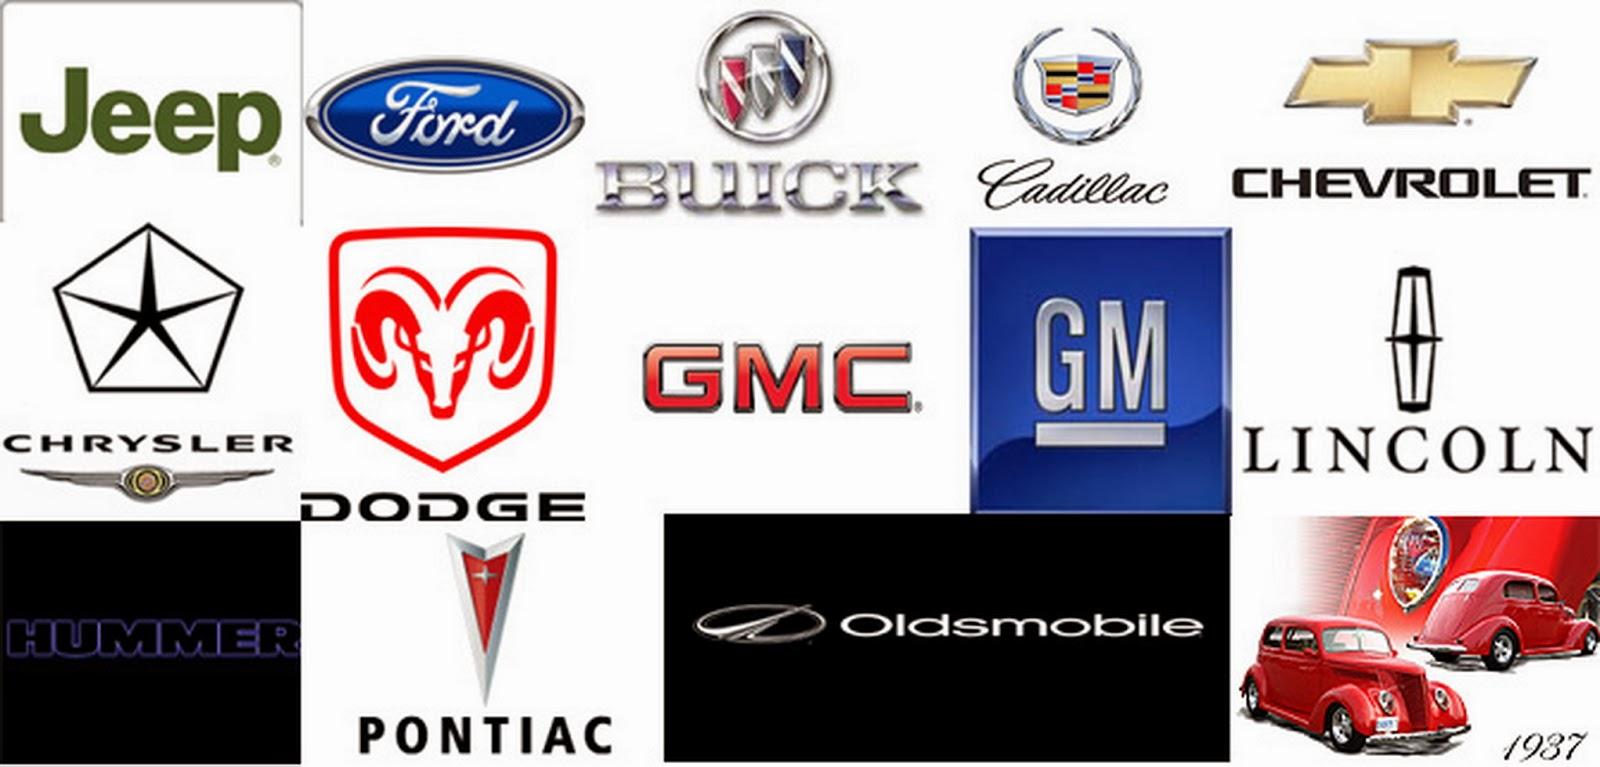 Car Logos, Branding and Marketing